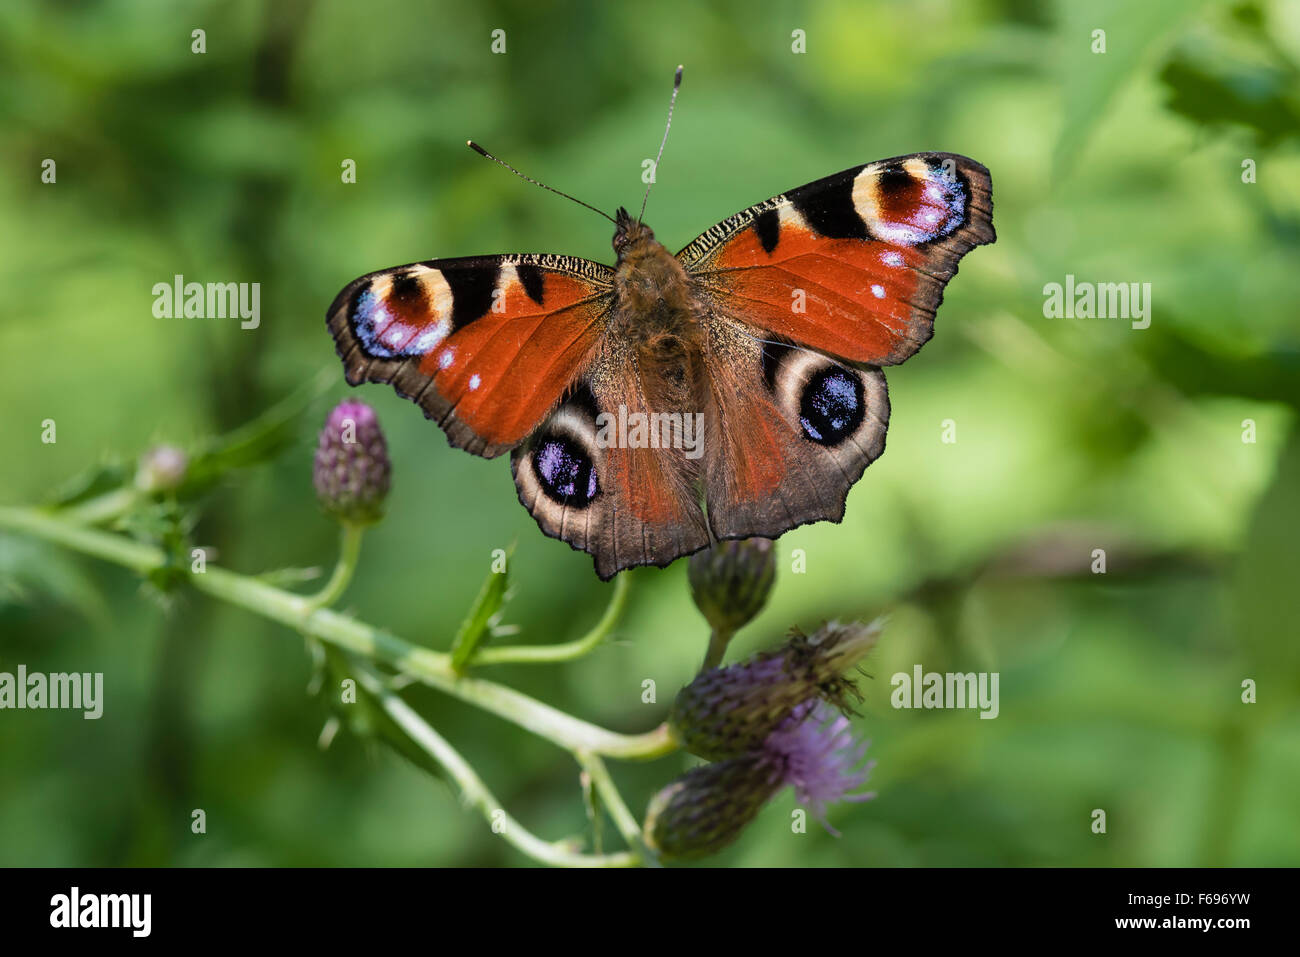 Tagpfauenauge, Aglais io, Europeo farfalla pavone Foto Stock